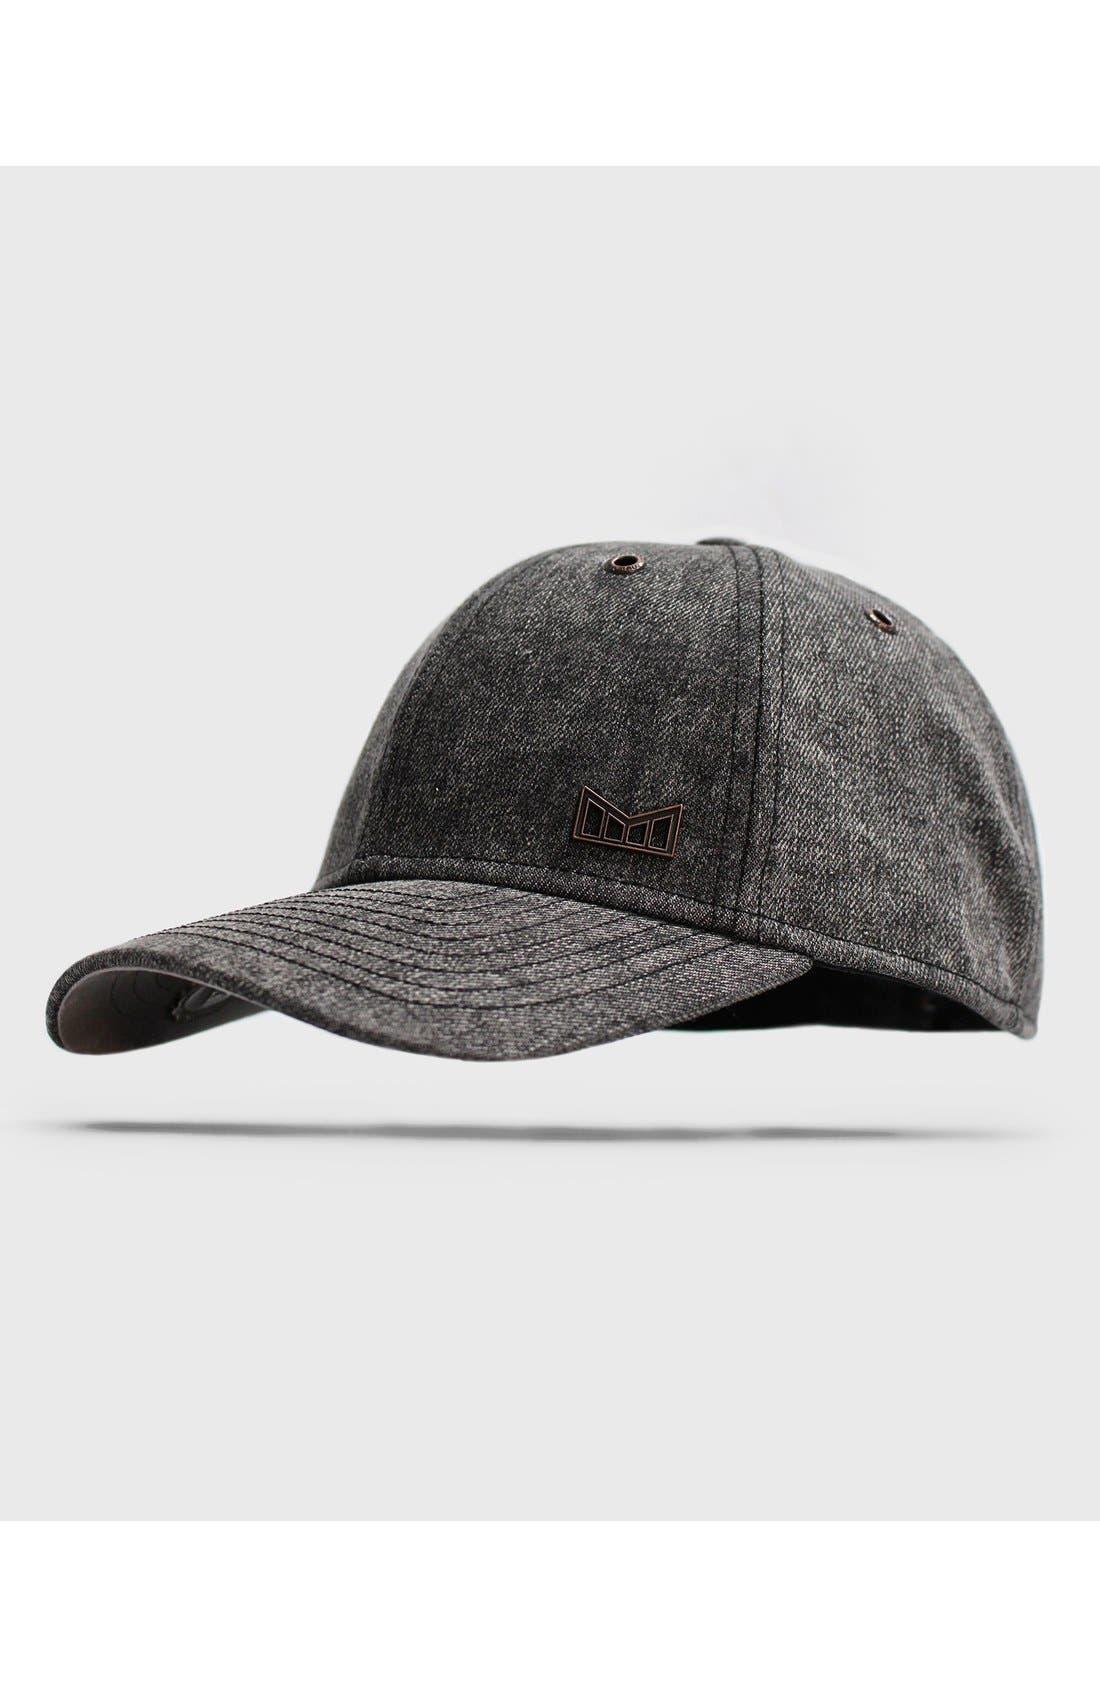 'The Haze' Vintage Fit Baseball Cap,                             Alternate thumbnail 8, color,                             001